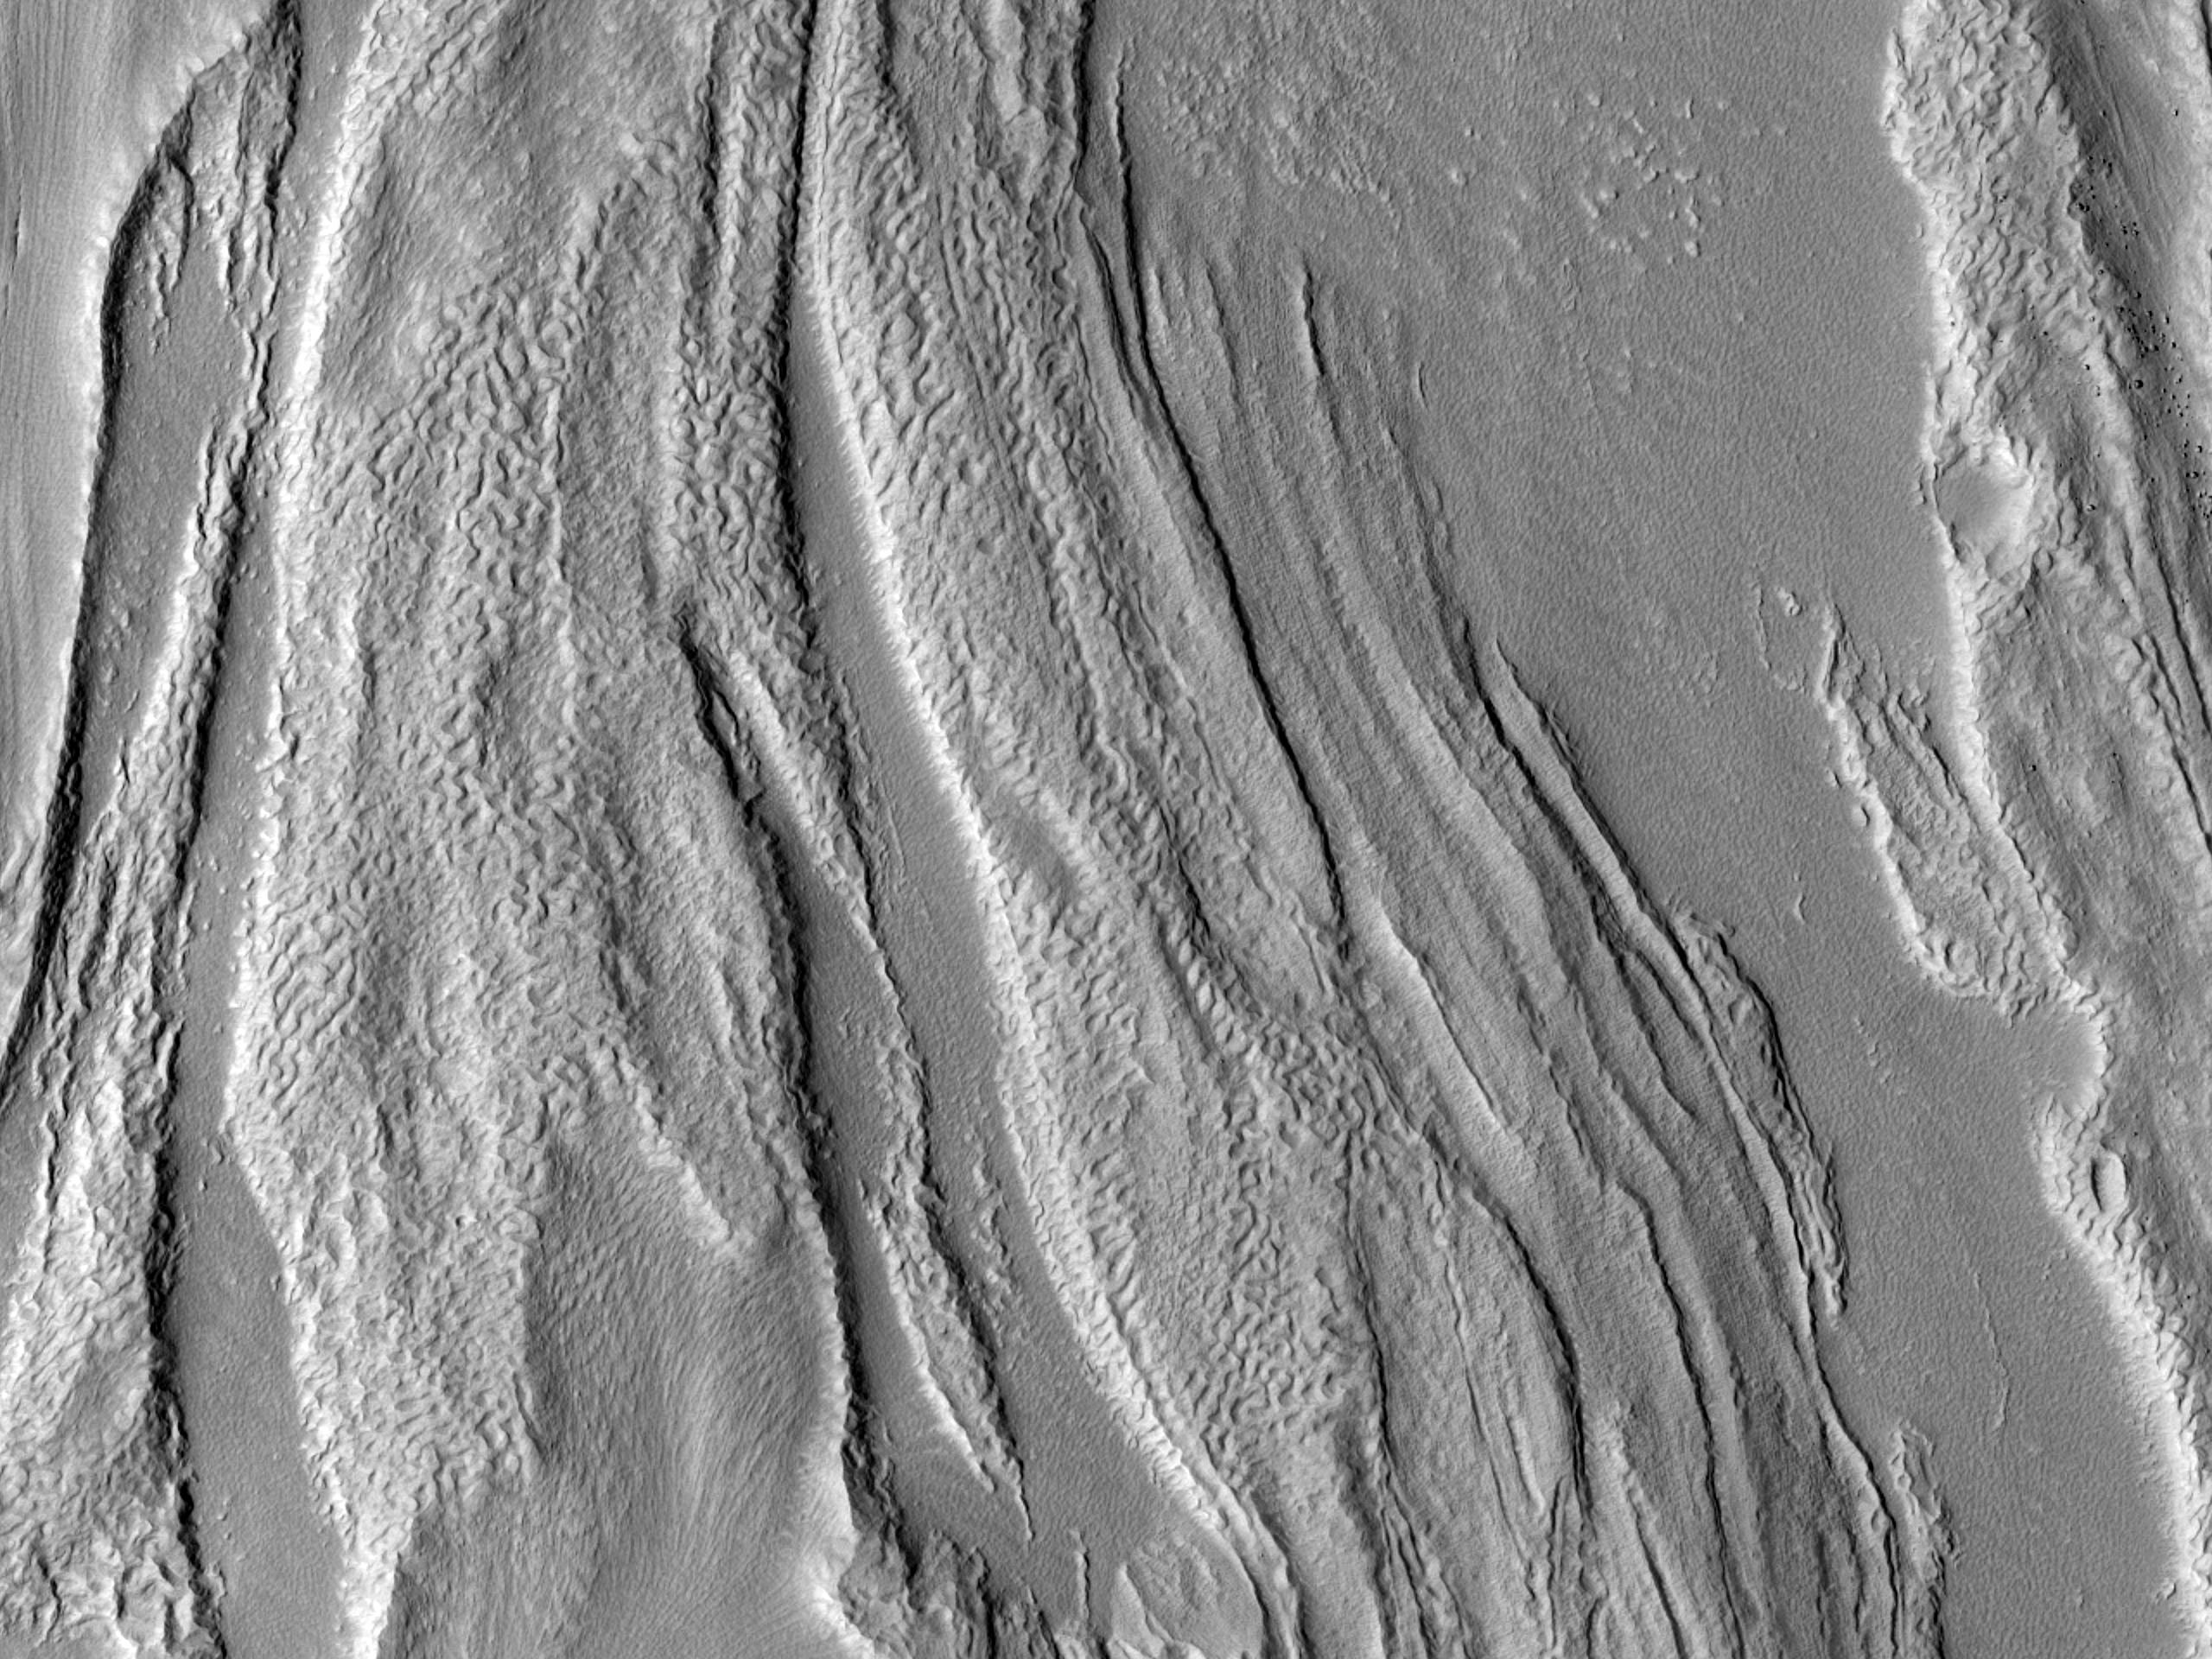 Материал на дне долины к северу от региона Arabia